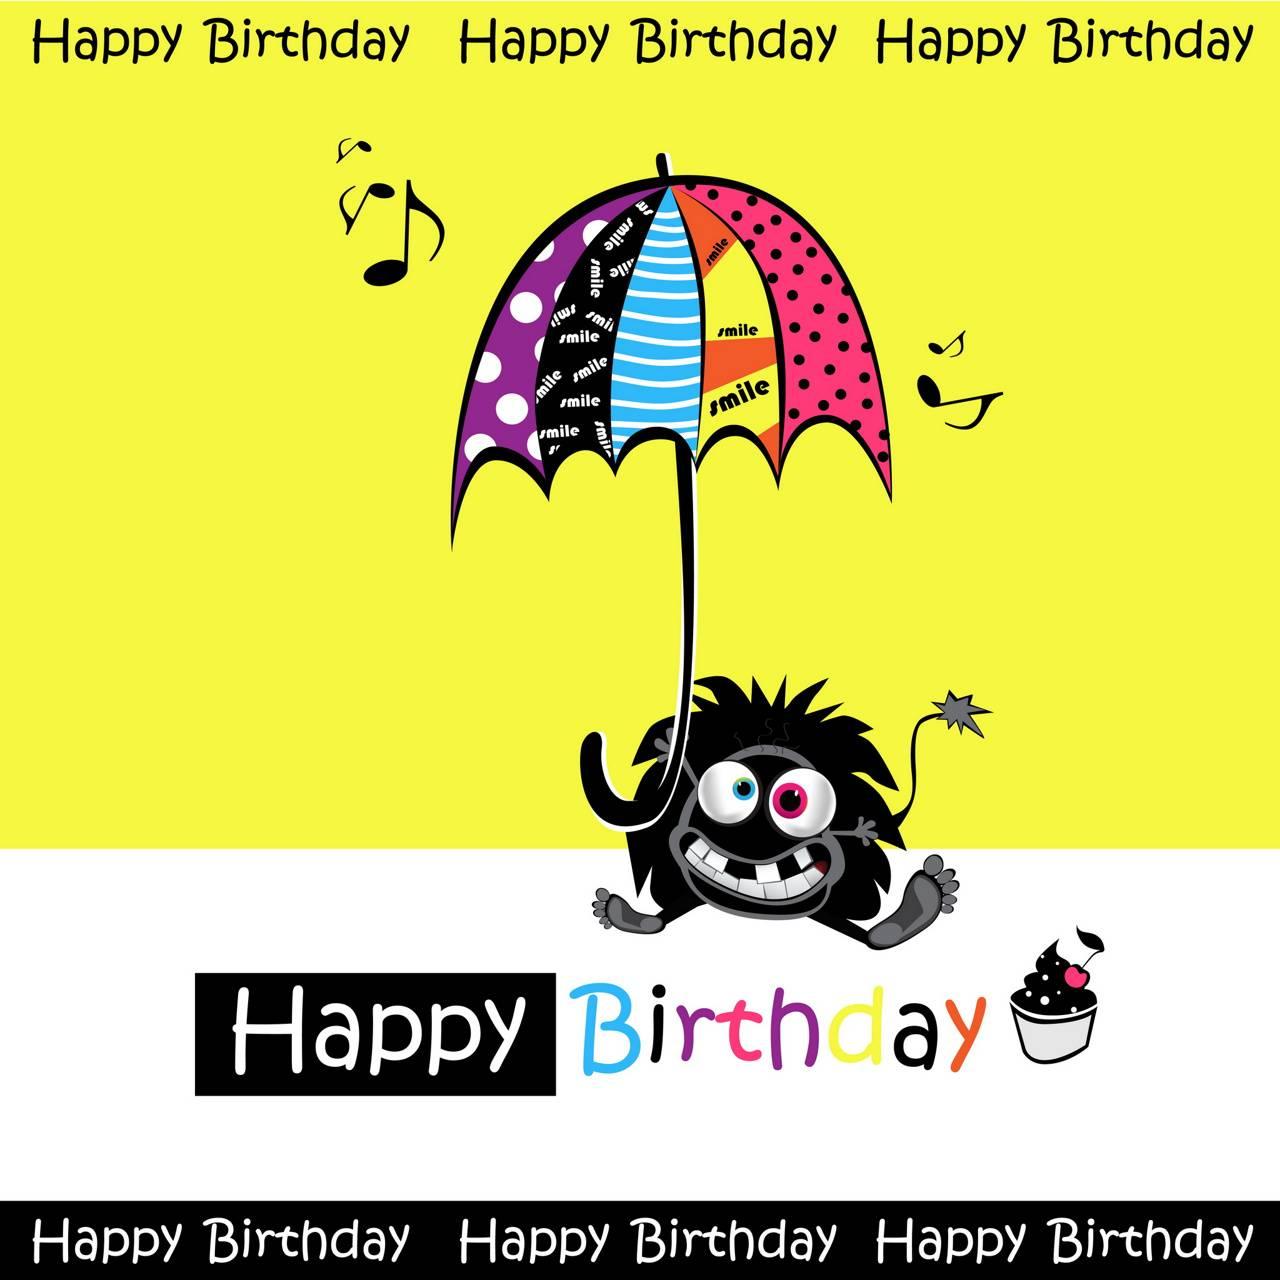 Happy Birthday Wallpaper By S 9c Free On Zedge